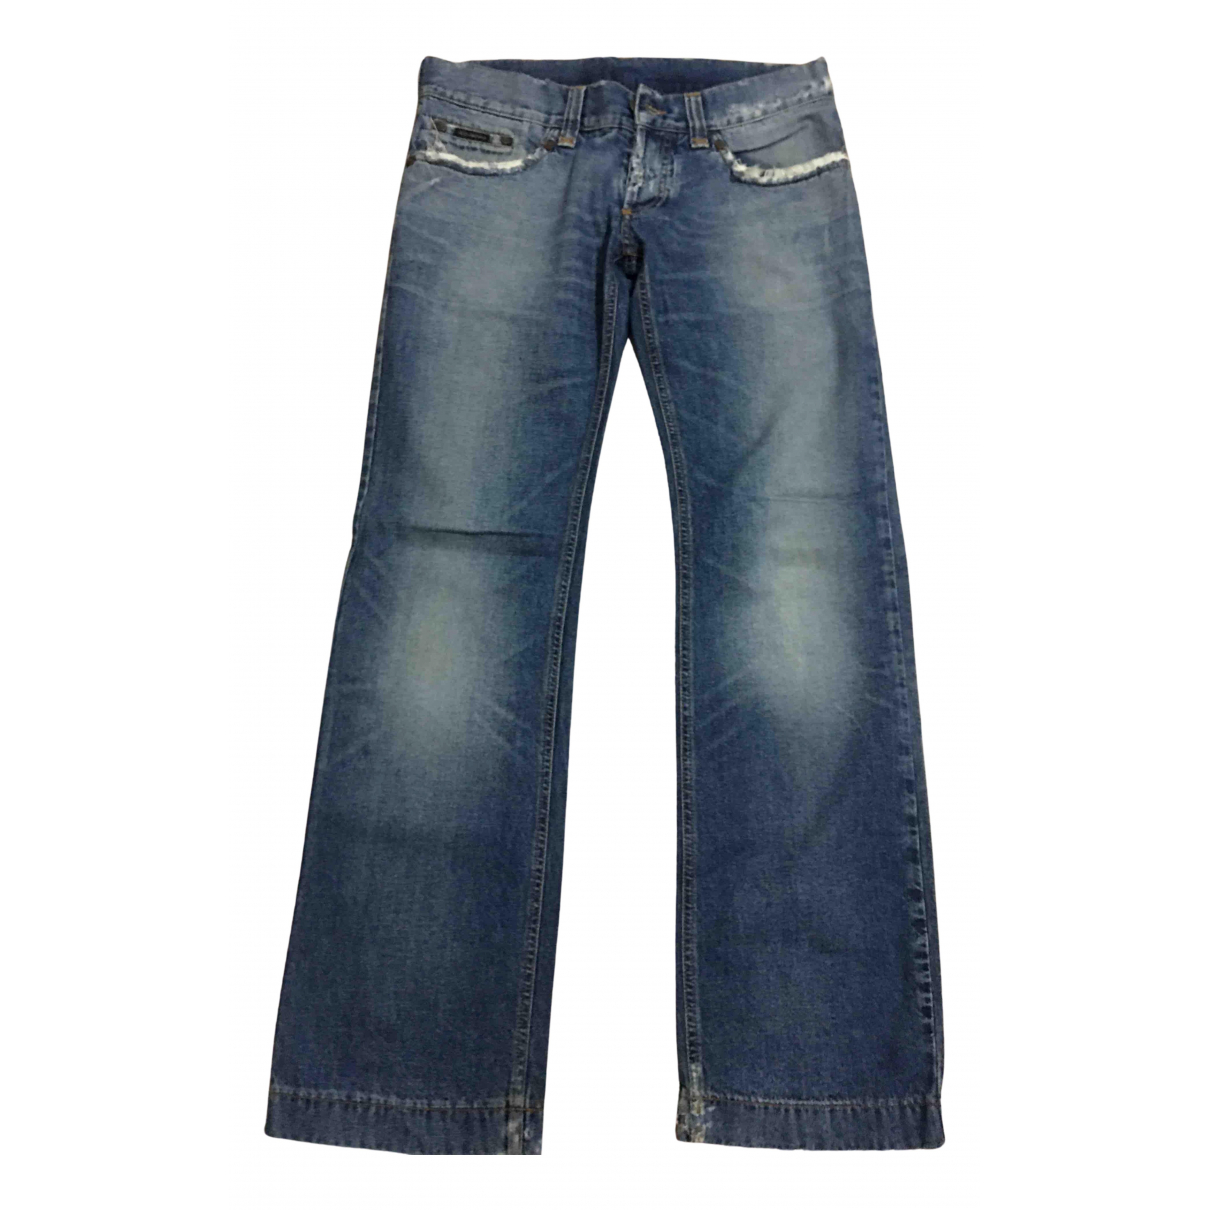 Dolce & Gabbana - Jean   pour homme en coton - bleu